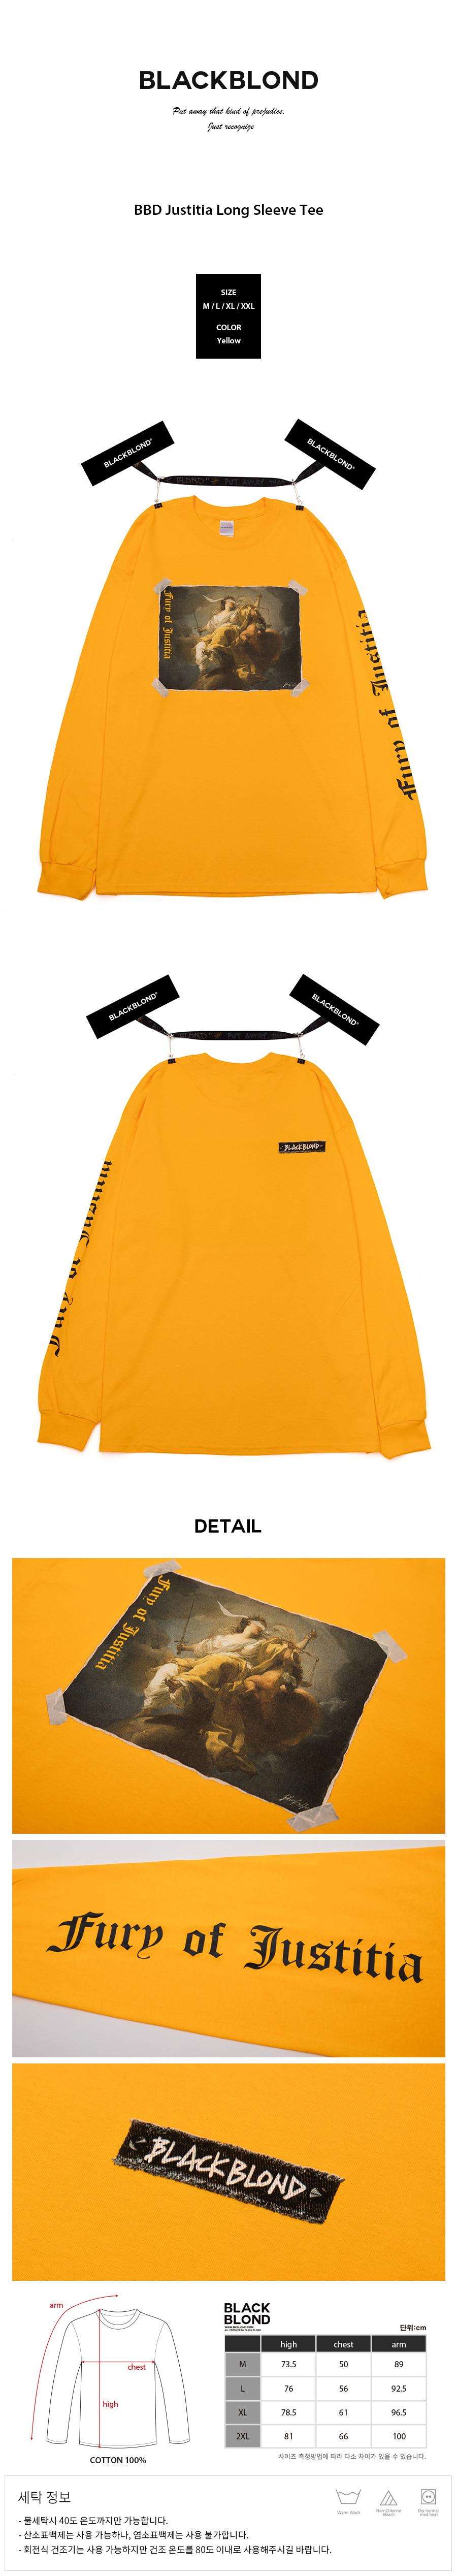 BLACKBLOND - BBD Justitia Long Sleeve Tee (Yellow)